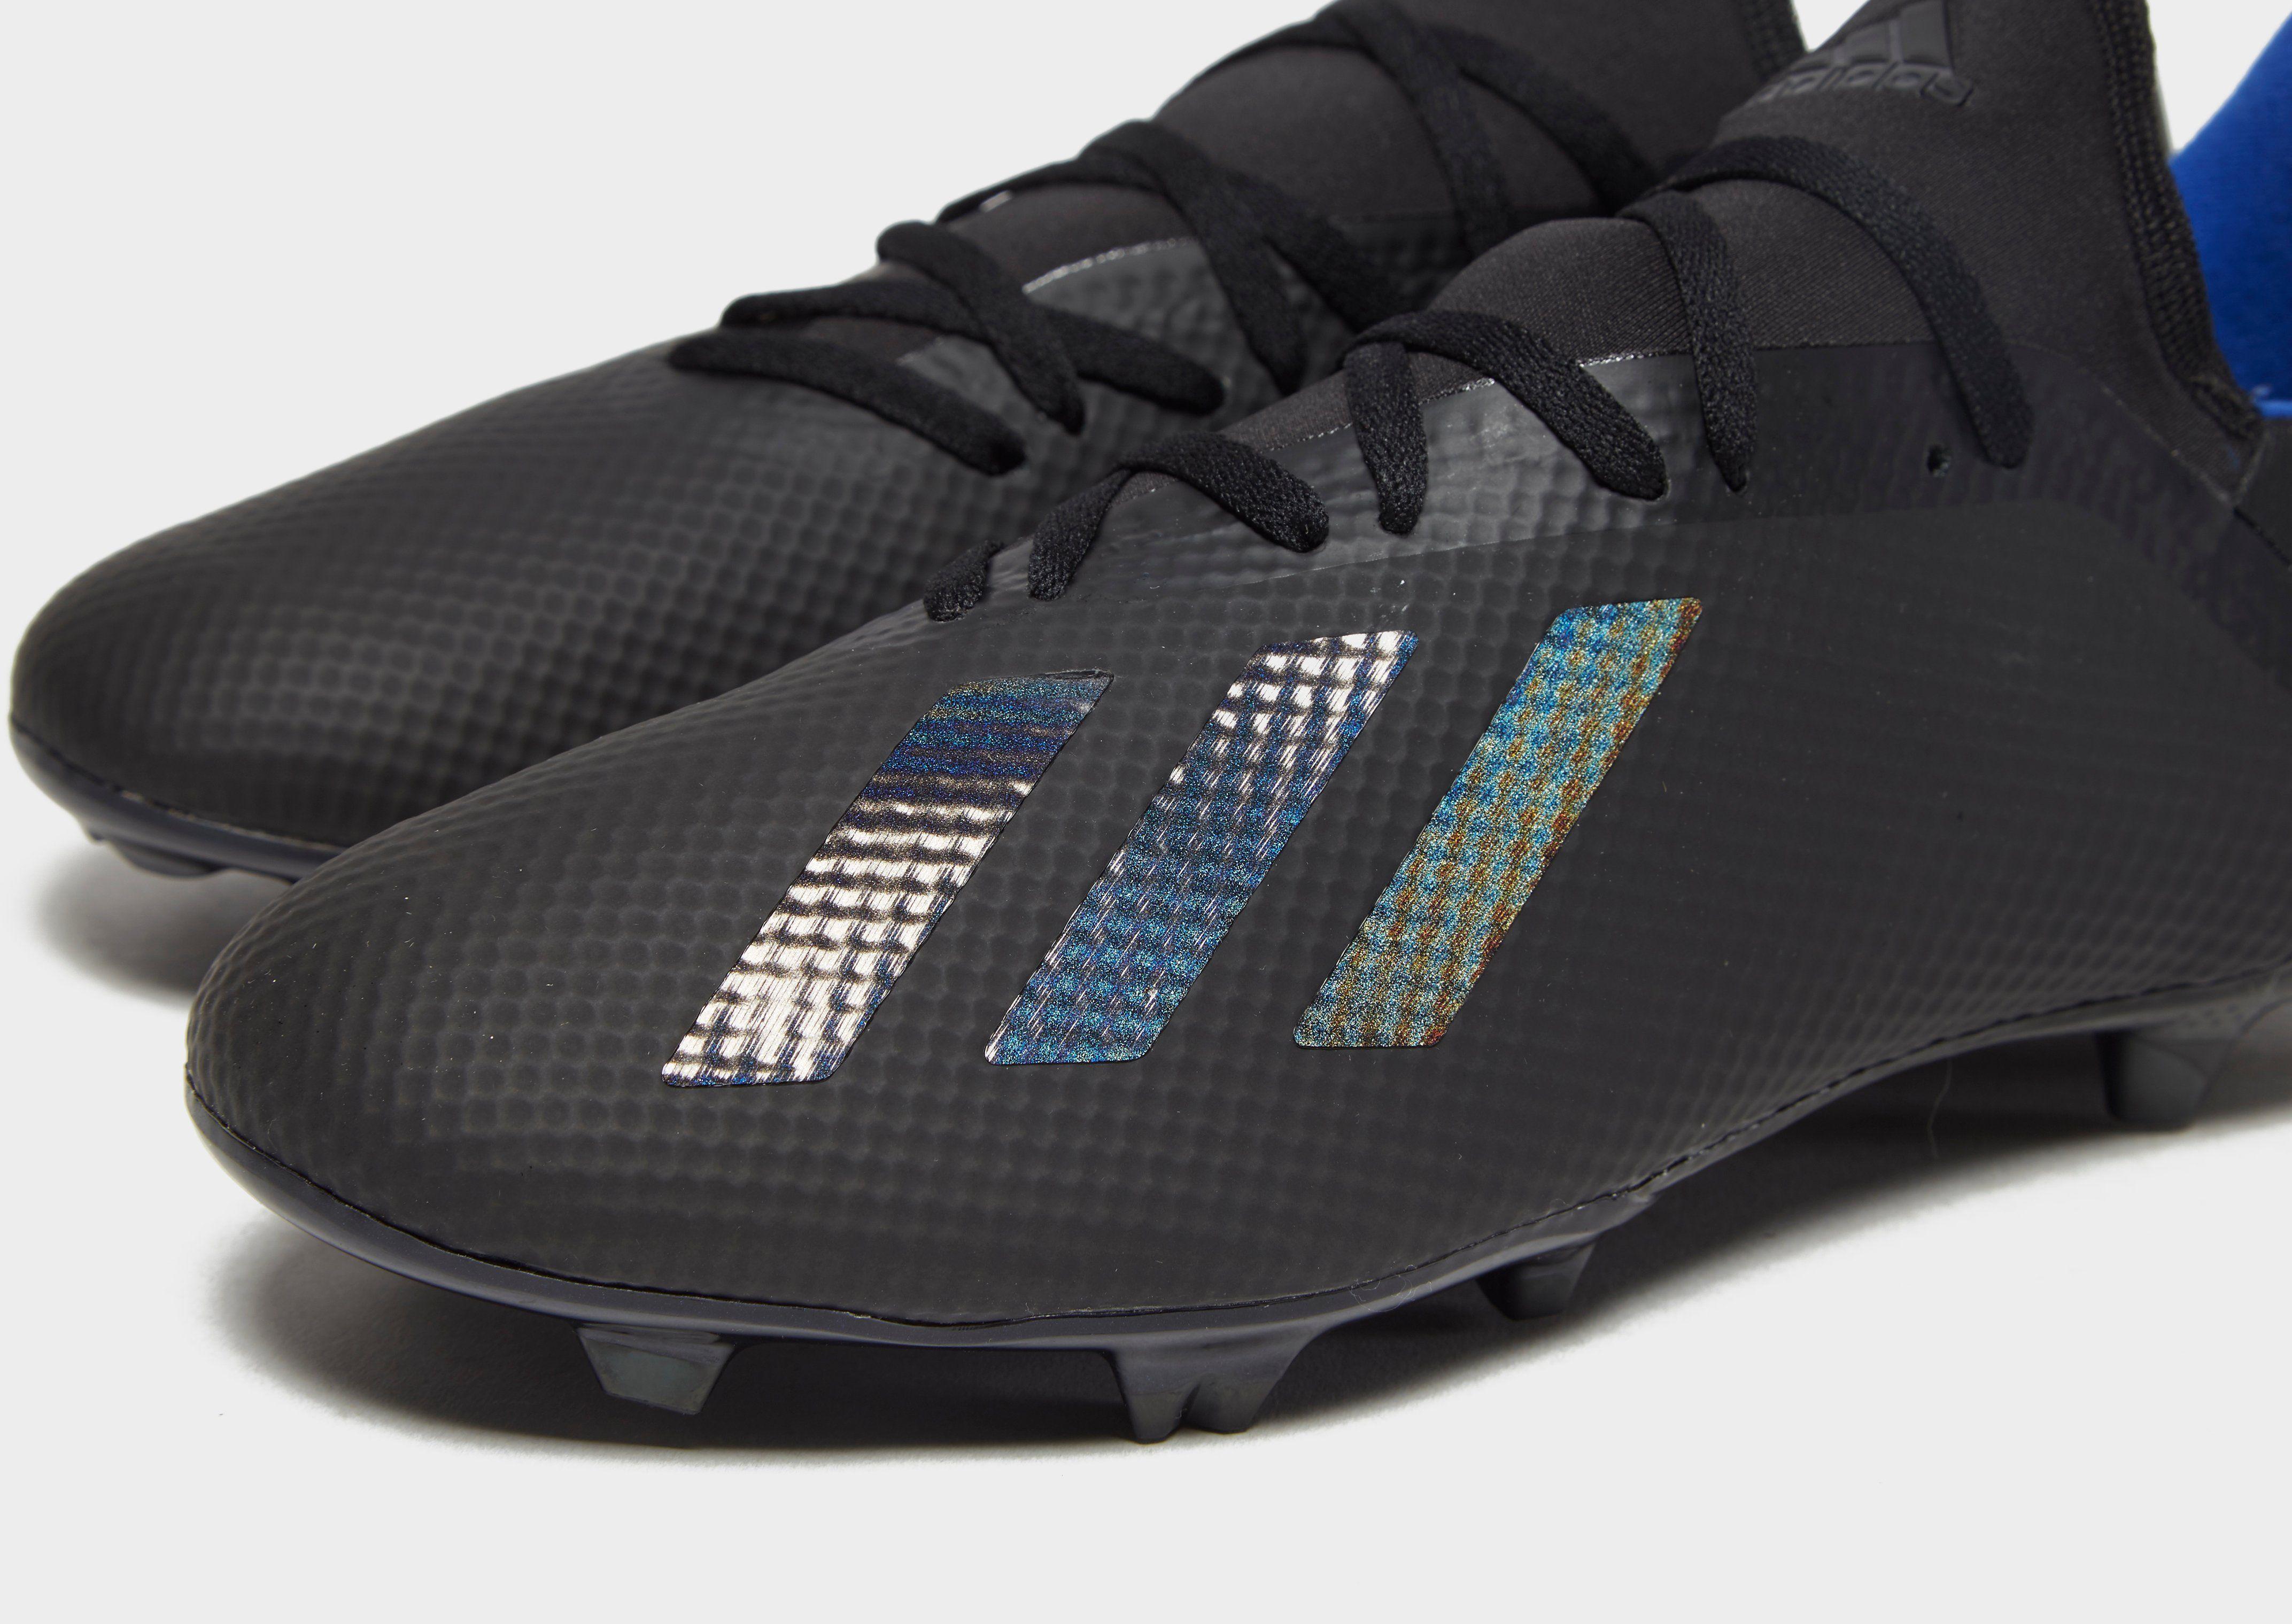 ADIDAS X 18.3 Firm Ground Boots